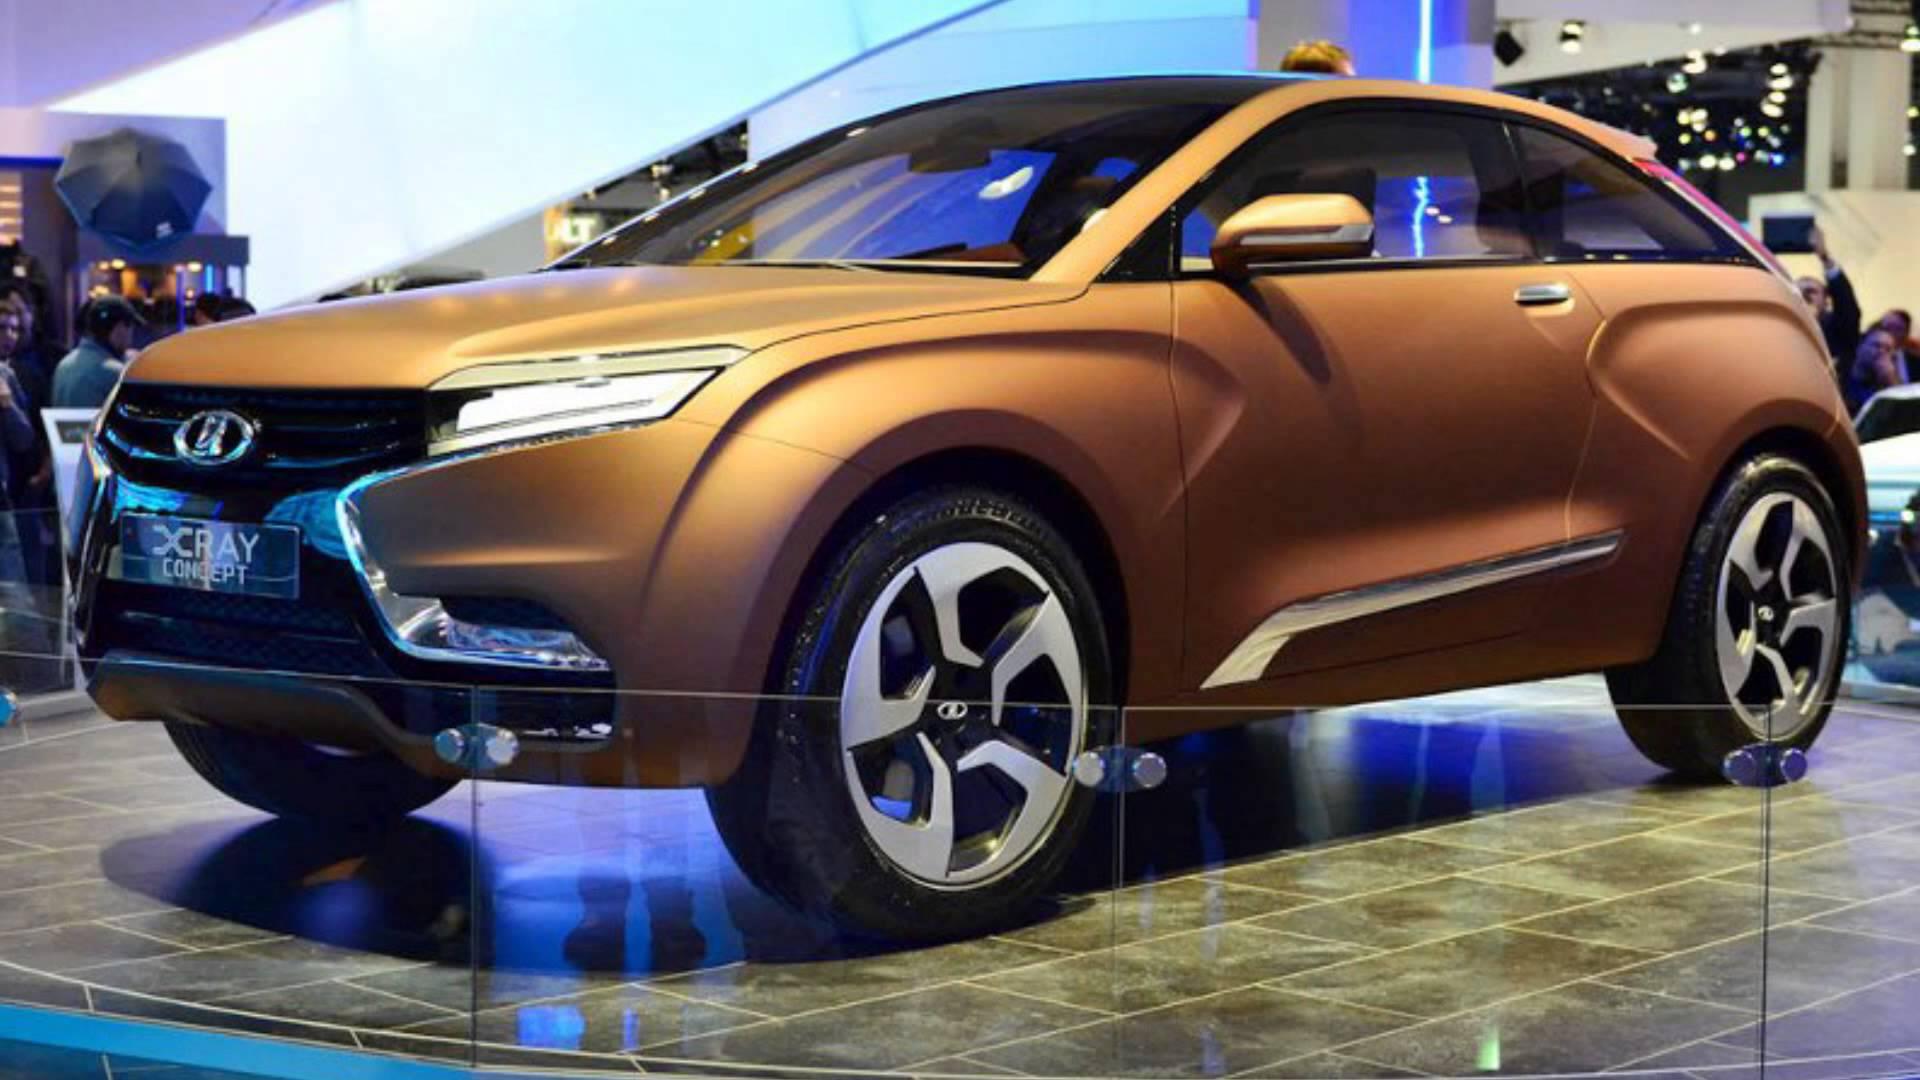 АвтоВаз приостановил проект Lada Xray Cross